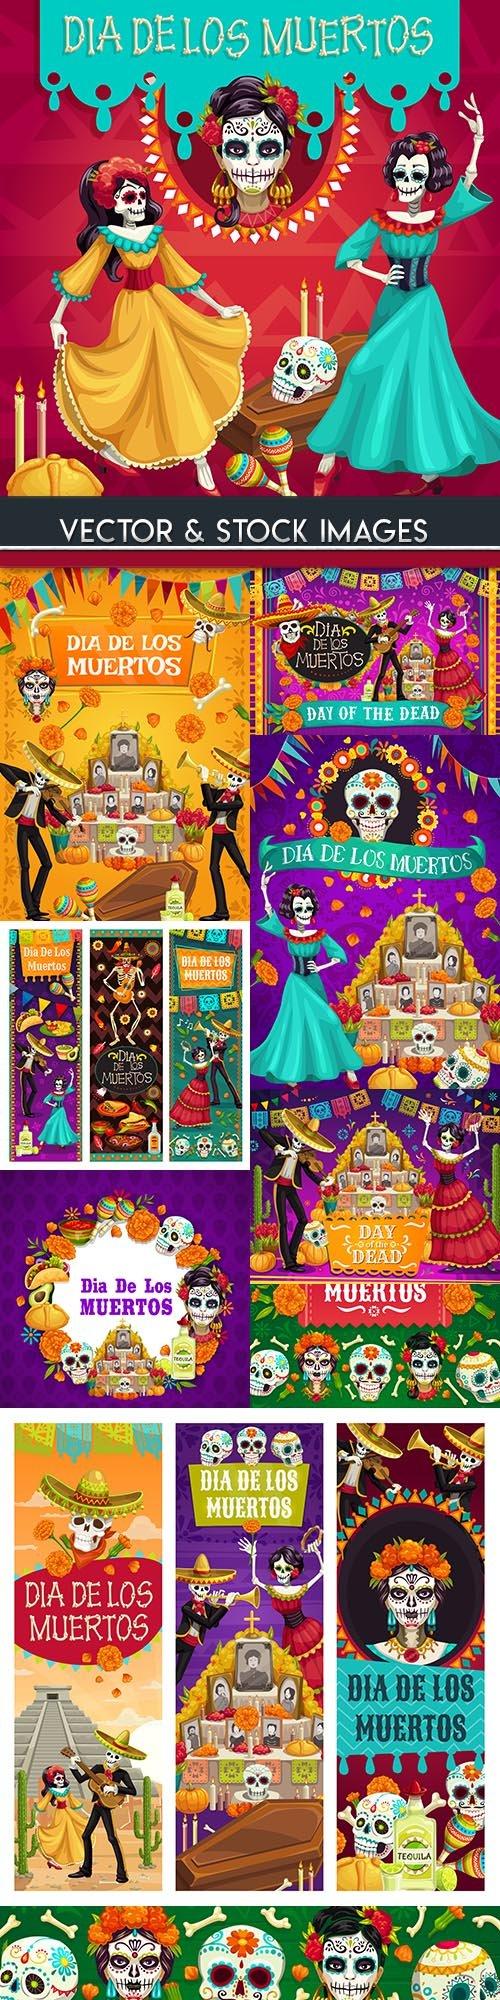 Mexico dead day celebration tradition illustration